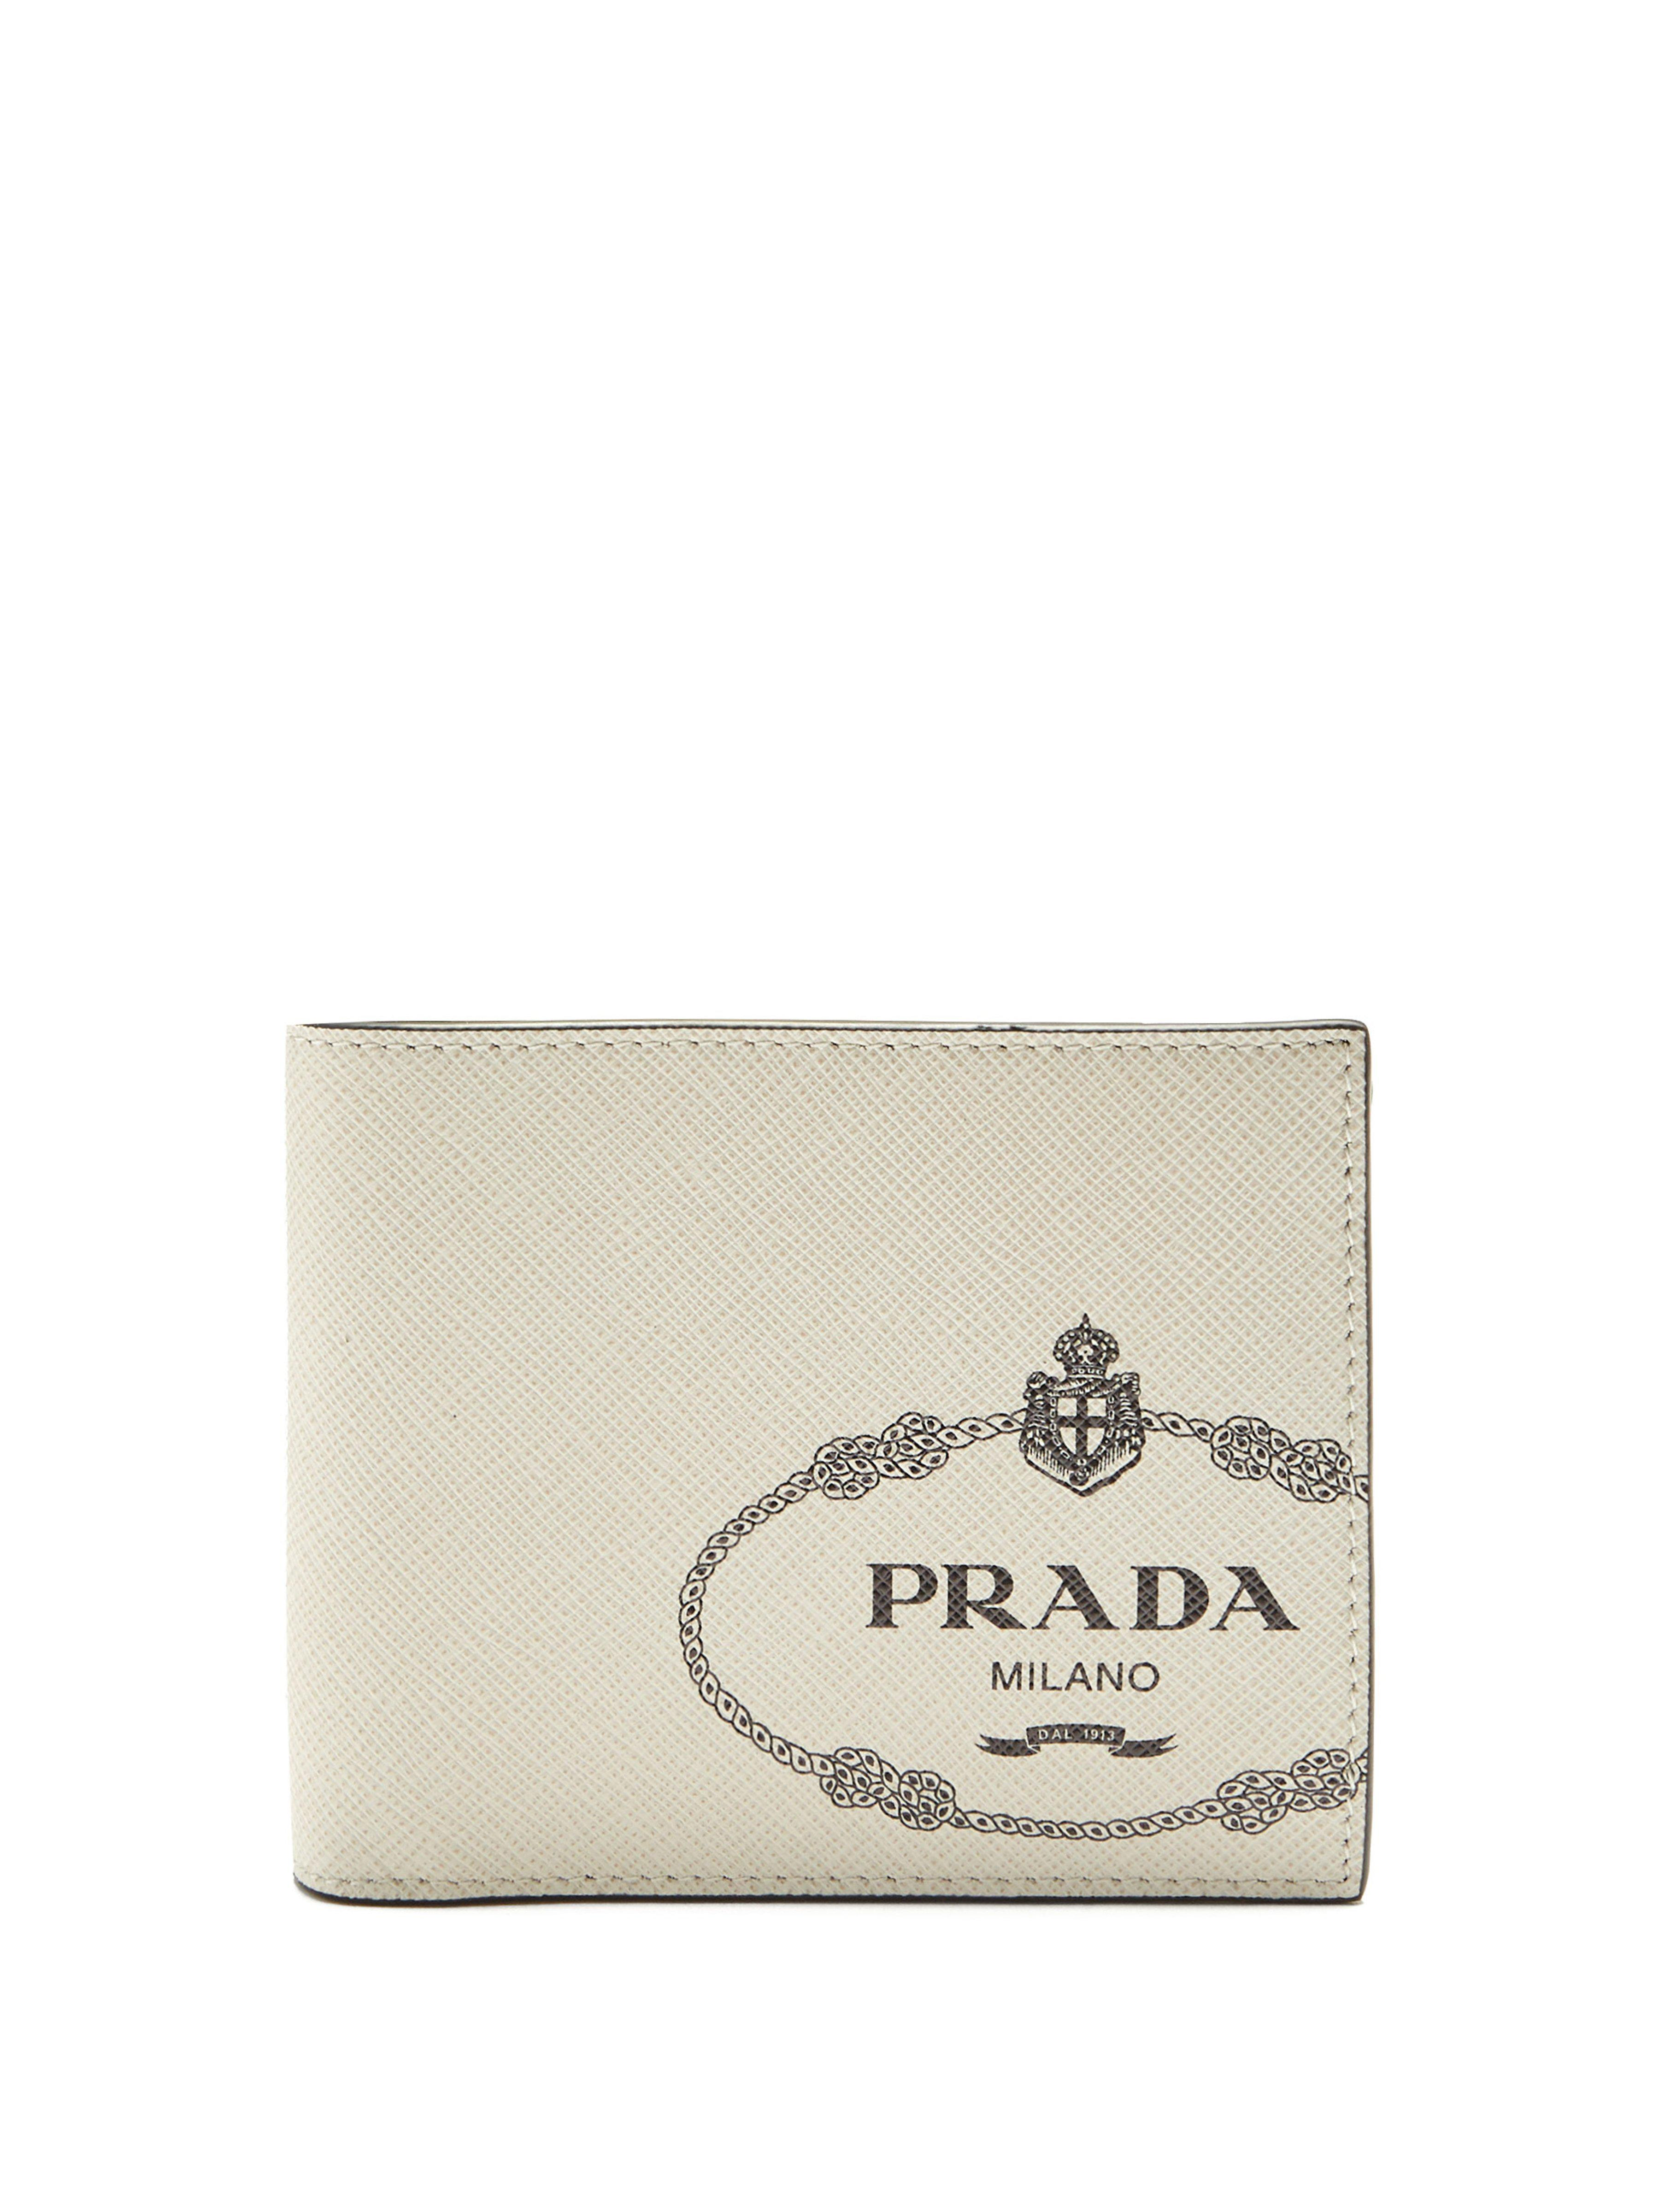 4d86c194e2812c Prada - White Logo Print Bi Fold Leather Wallet for Men - Lyst. View  fullscreen